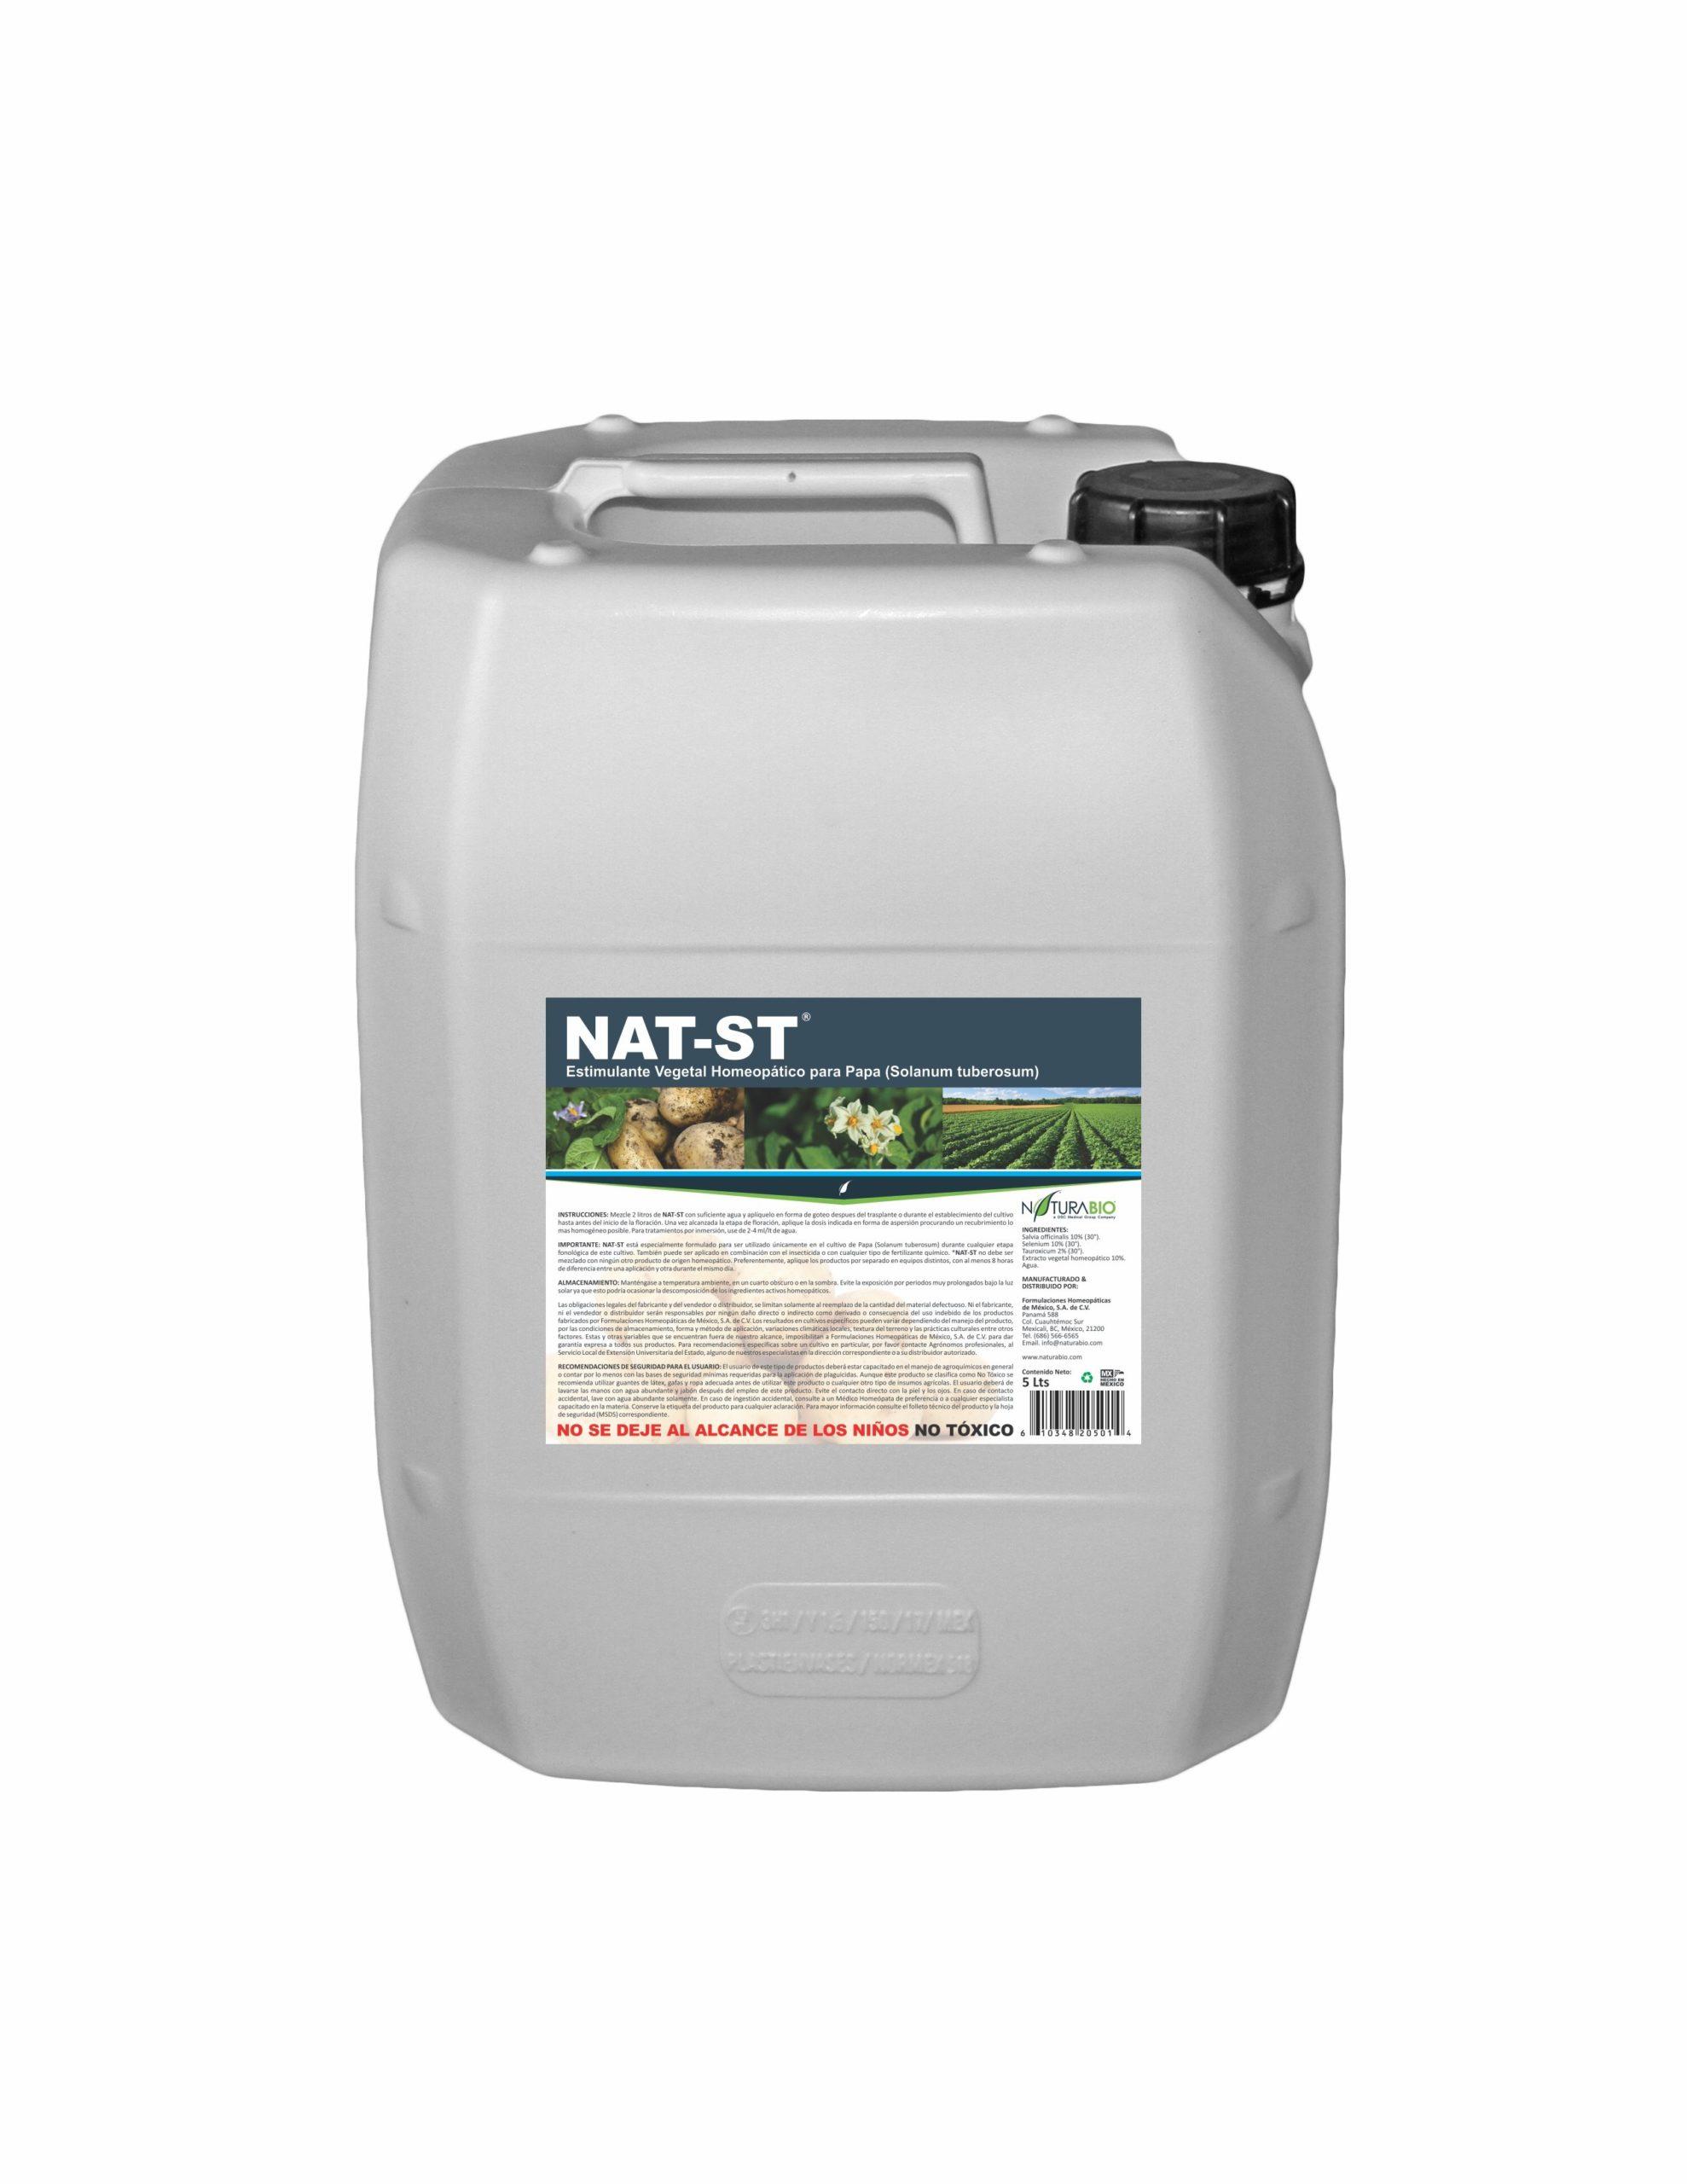 NAT-ST Estimulante Vegetal Homeopático para Papa